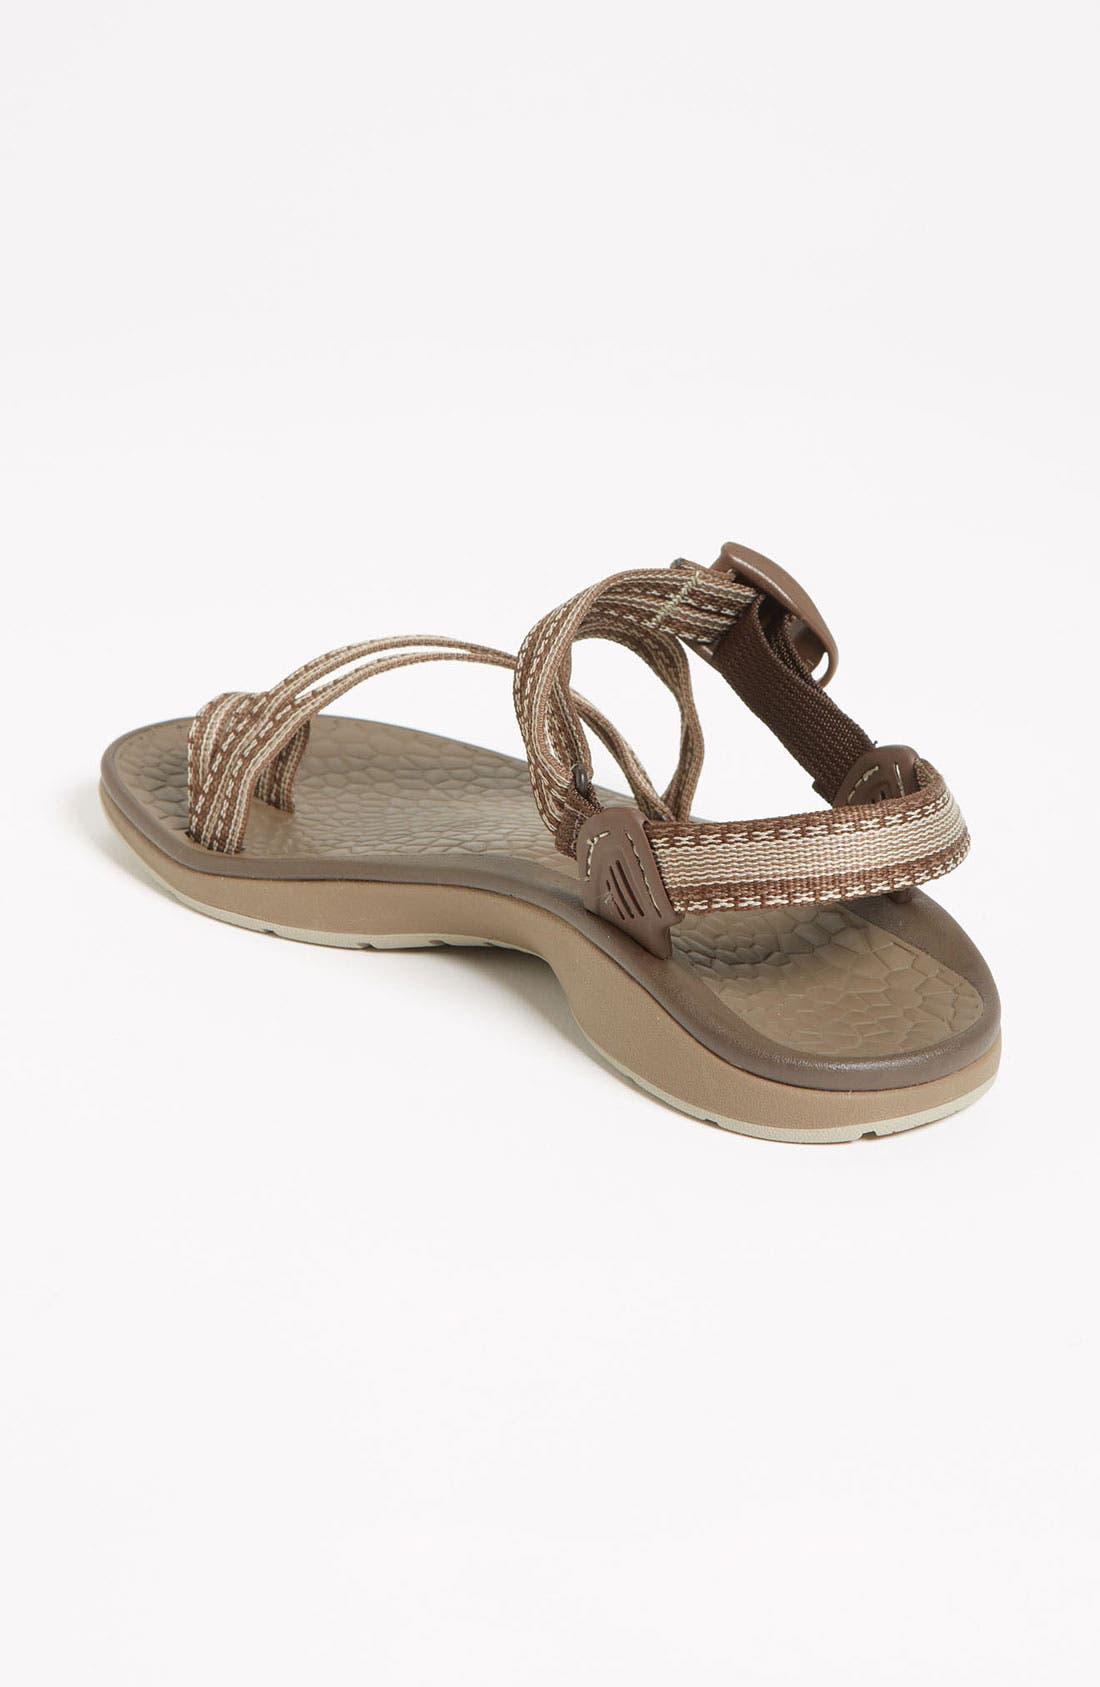 Alternate Image 2  - Chaco 'Fantasia' Sandal